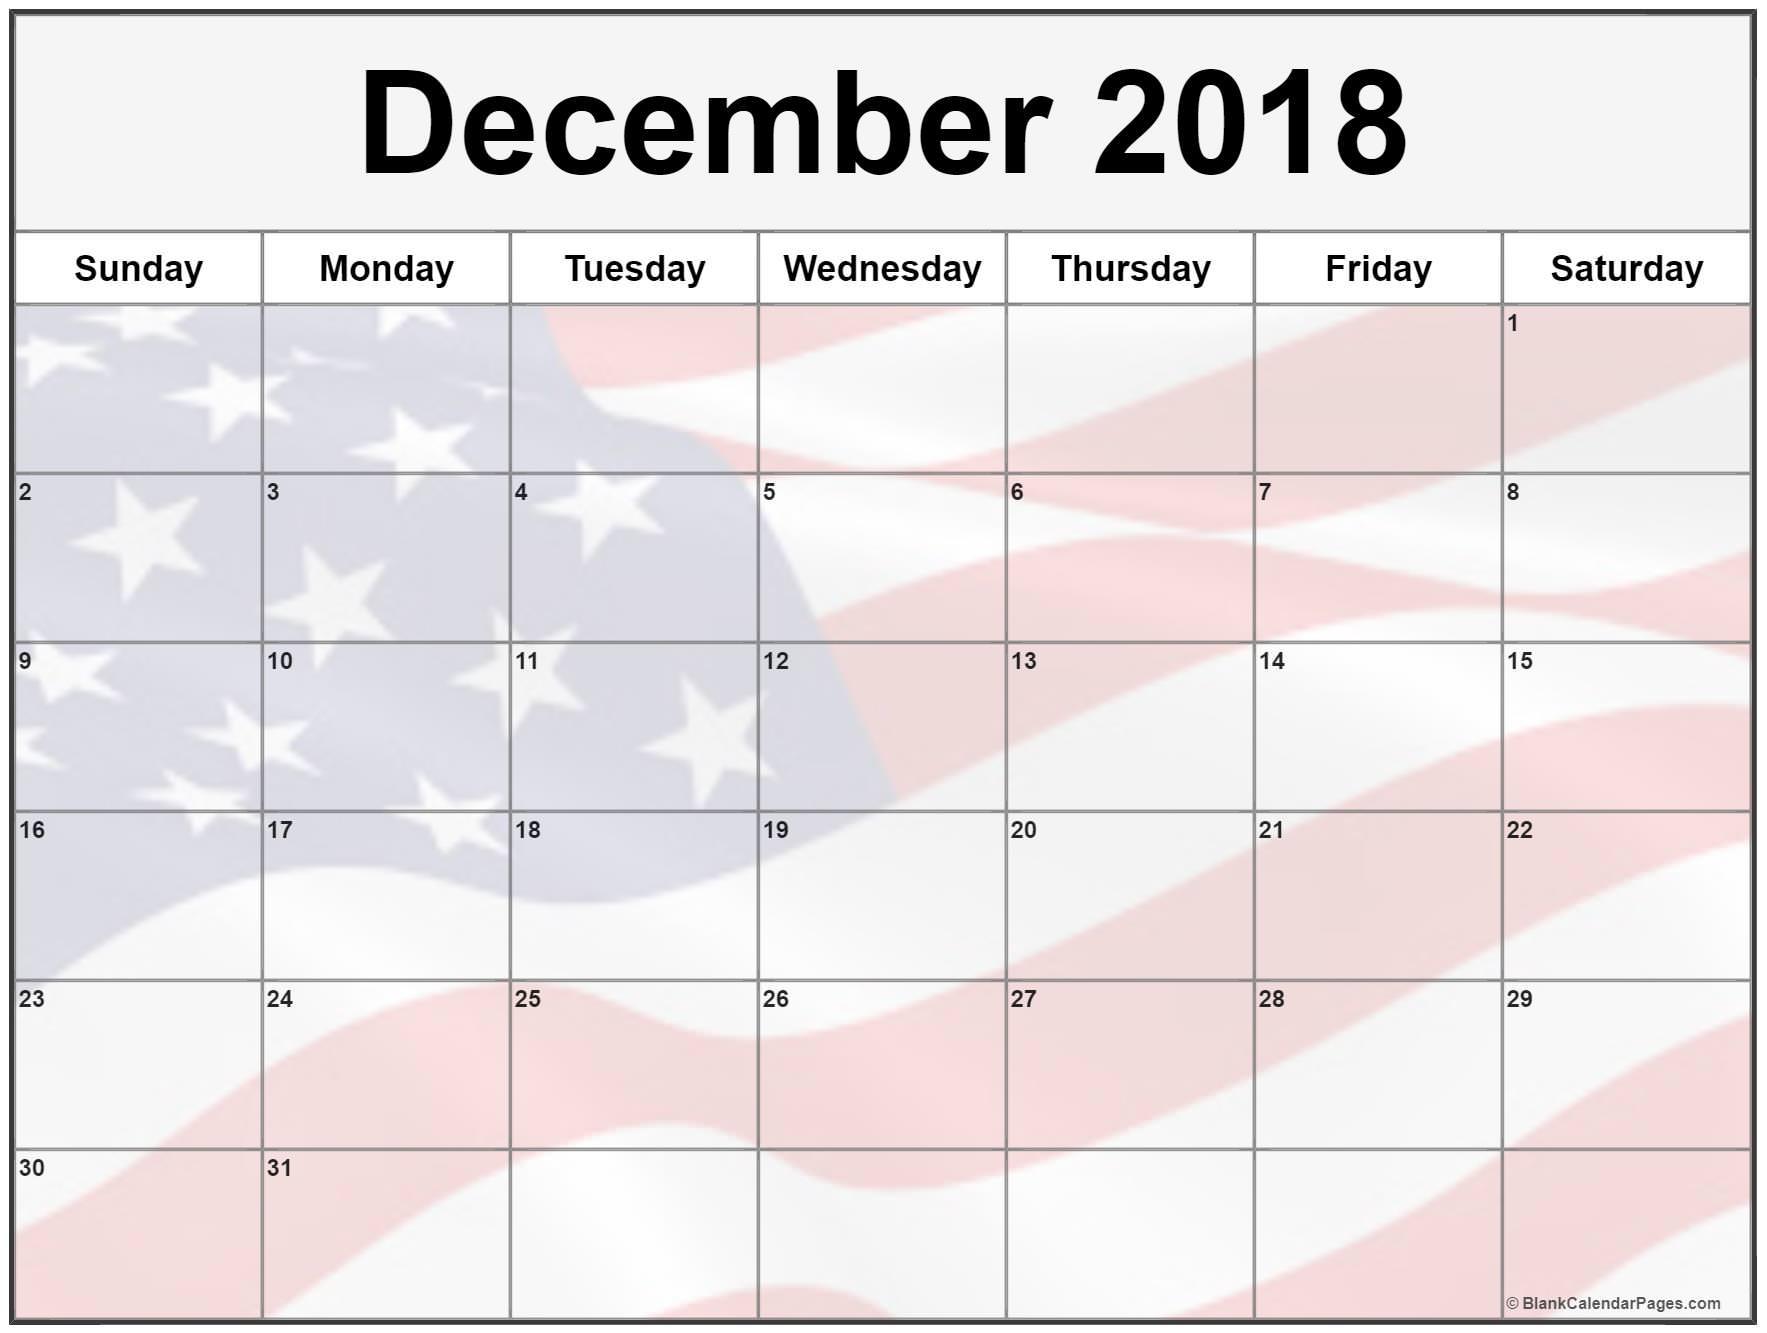 December 2018 Calendar USA